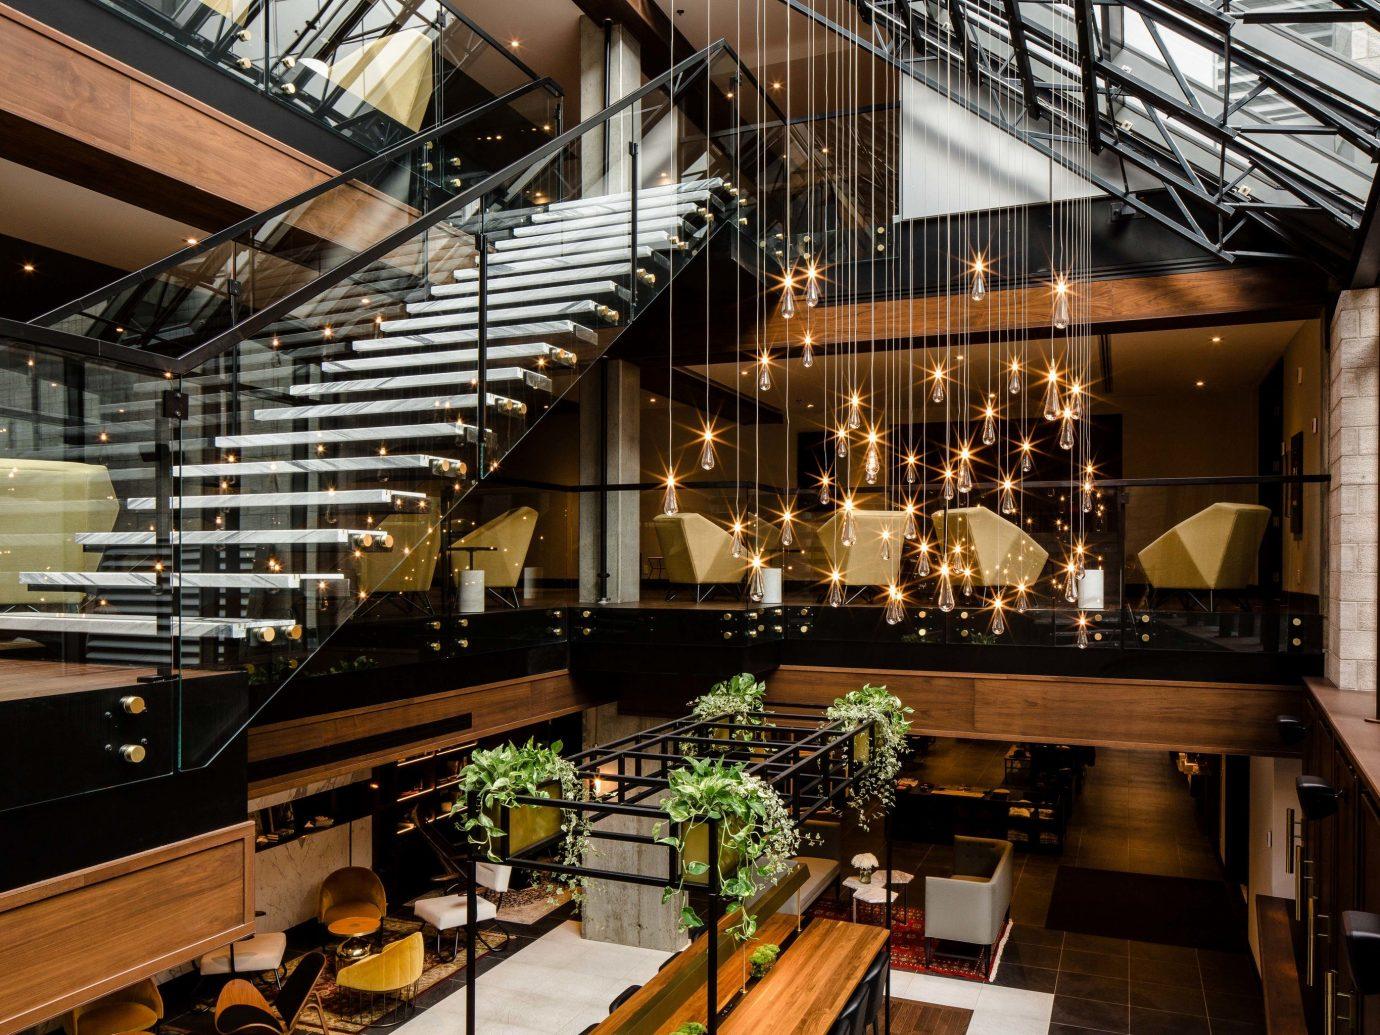 Canada Hotels Montreal Trip Ideas indoor interior design Lobby building